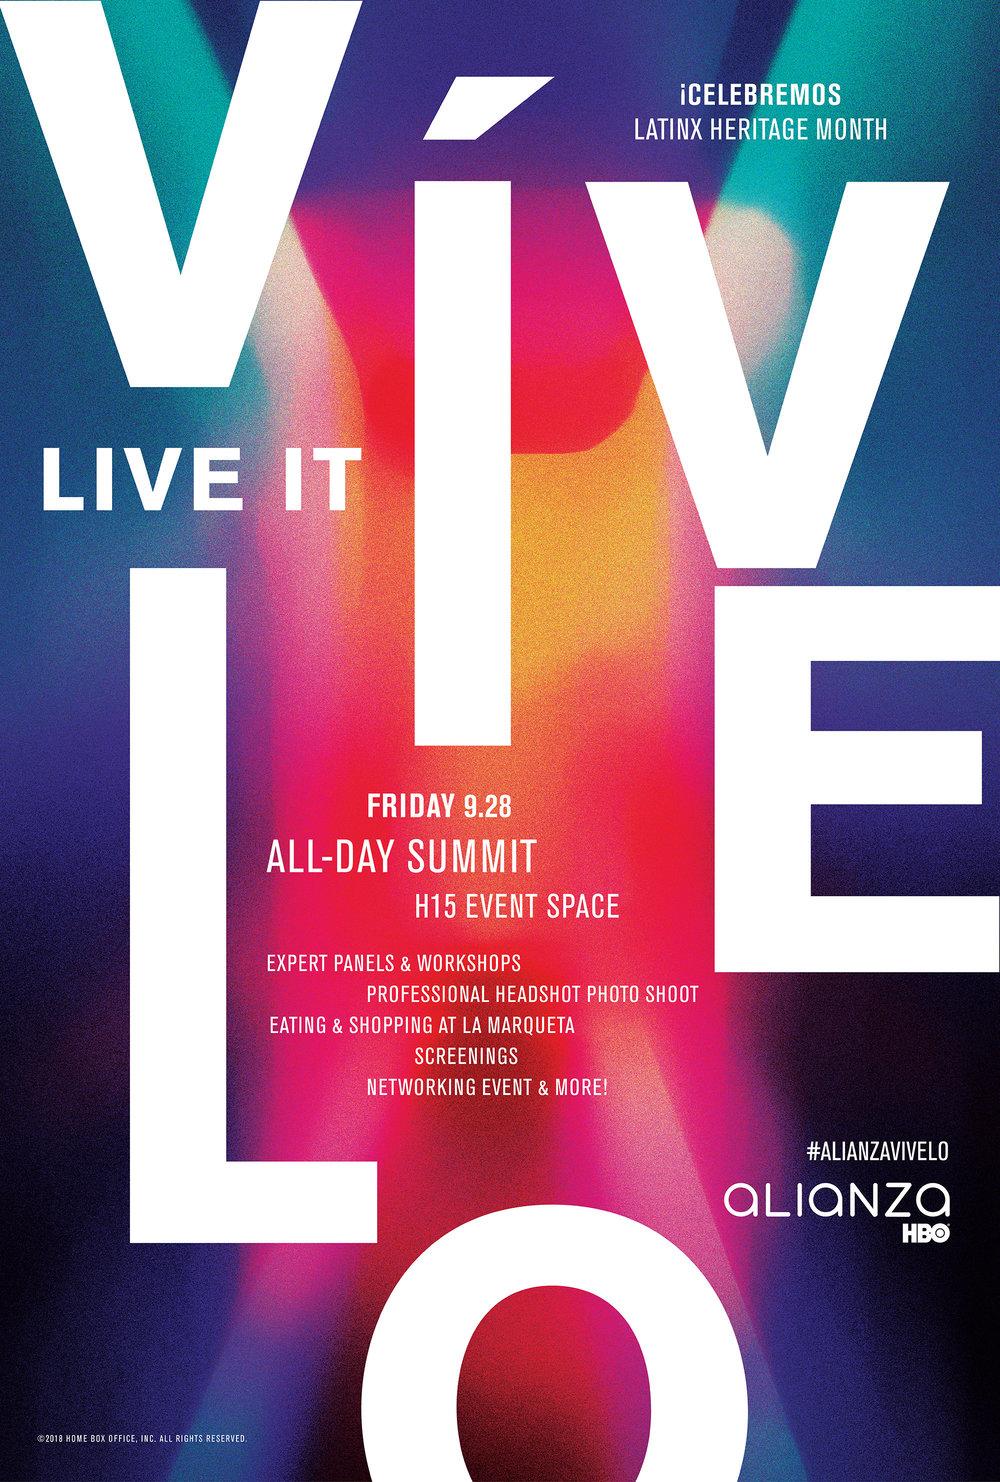 1468061_ERG_Alianza_2018 Summit_Poster_03.jpg